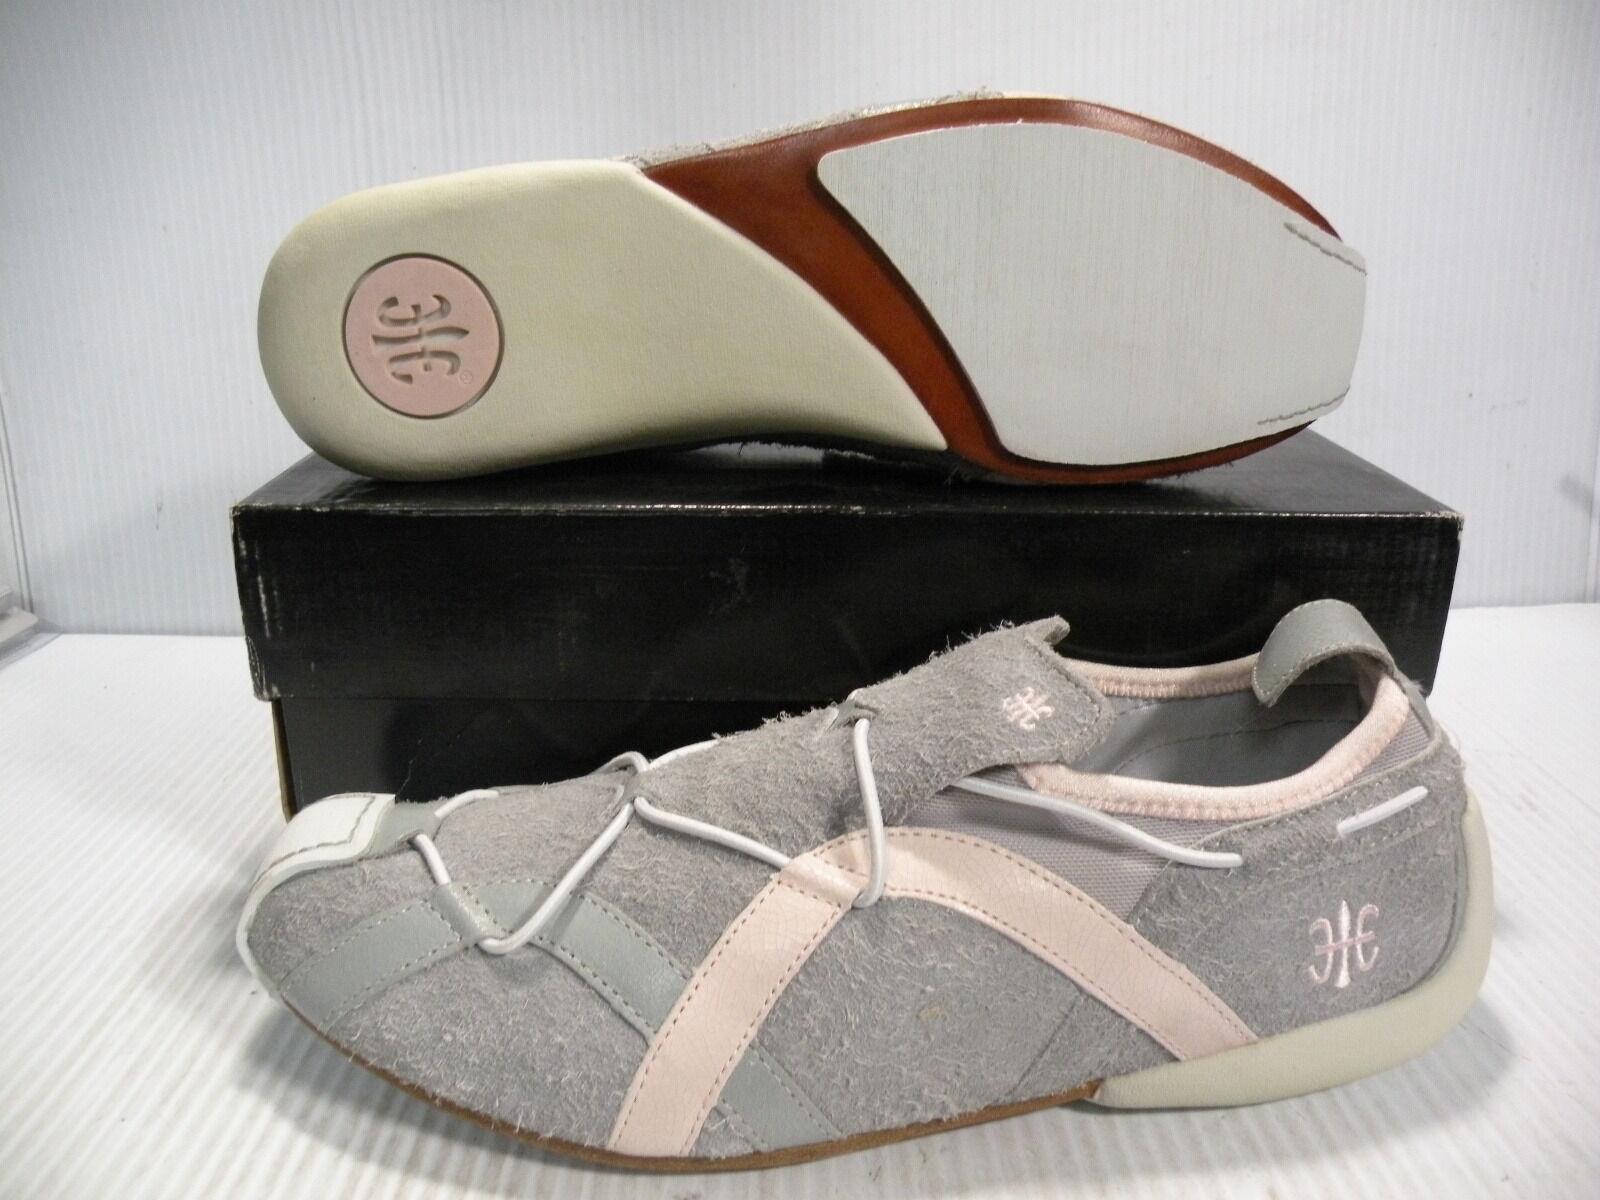 ROYAL ELASTICS LADECH LOW SUEDE WOMEN Schuhe PINK/GREY 9325025 SIZE 11 NEW